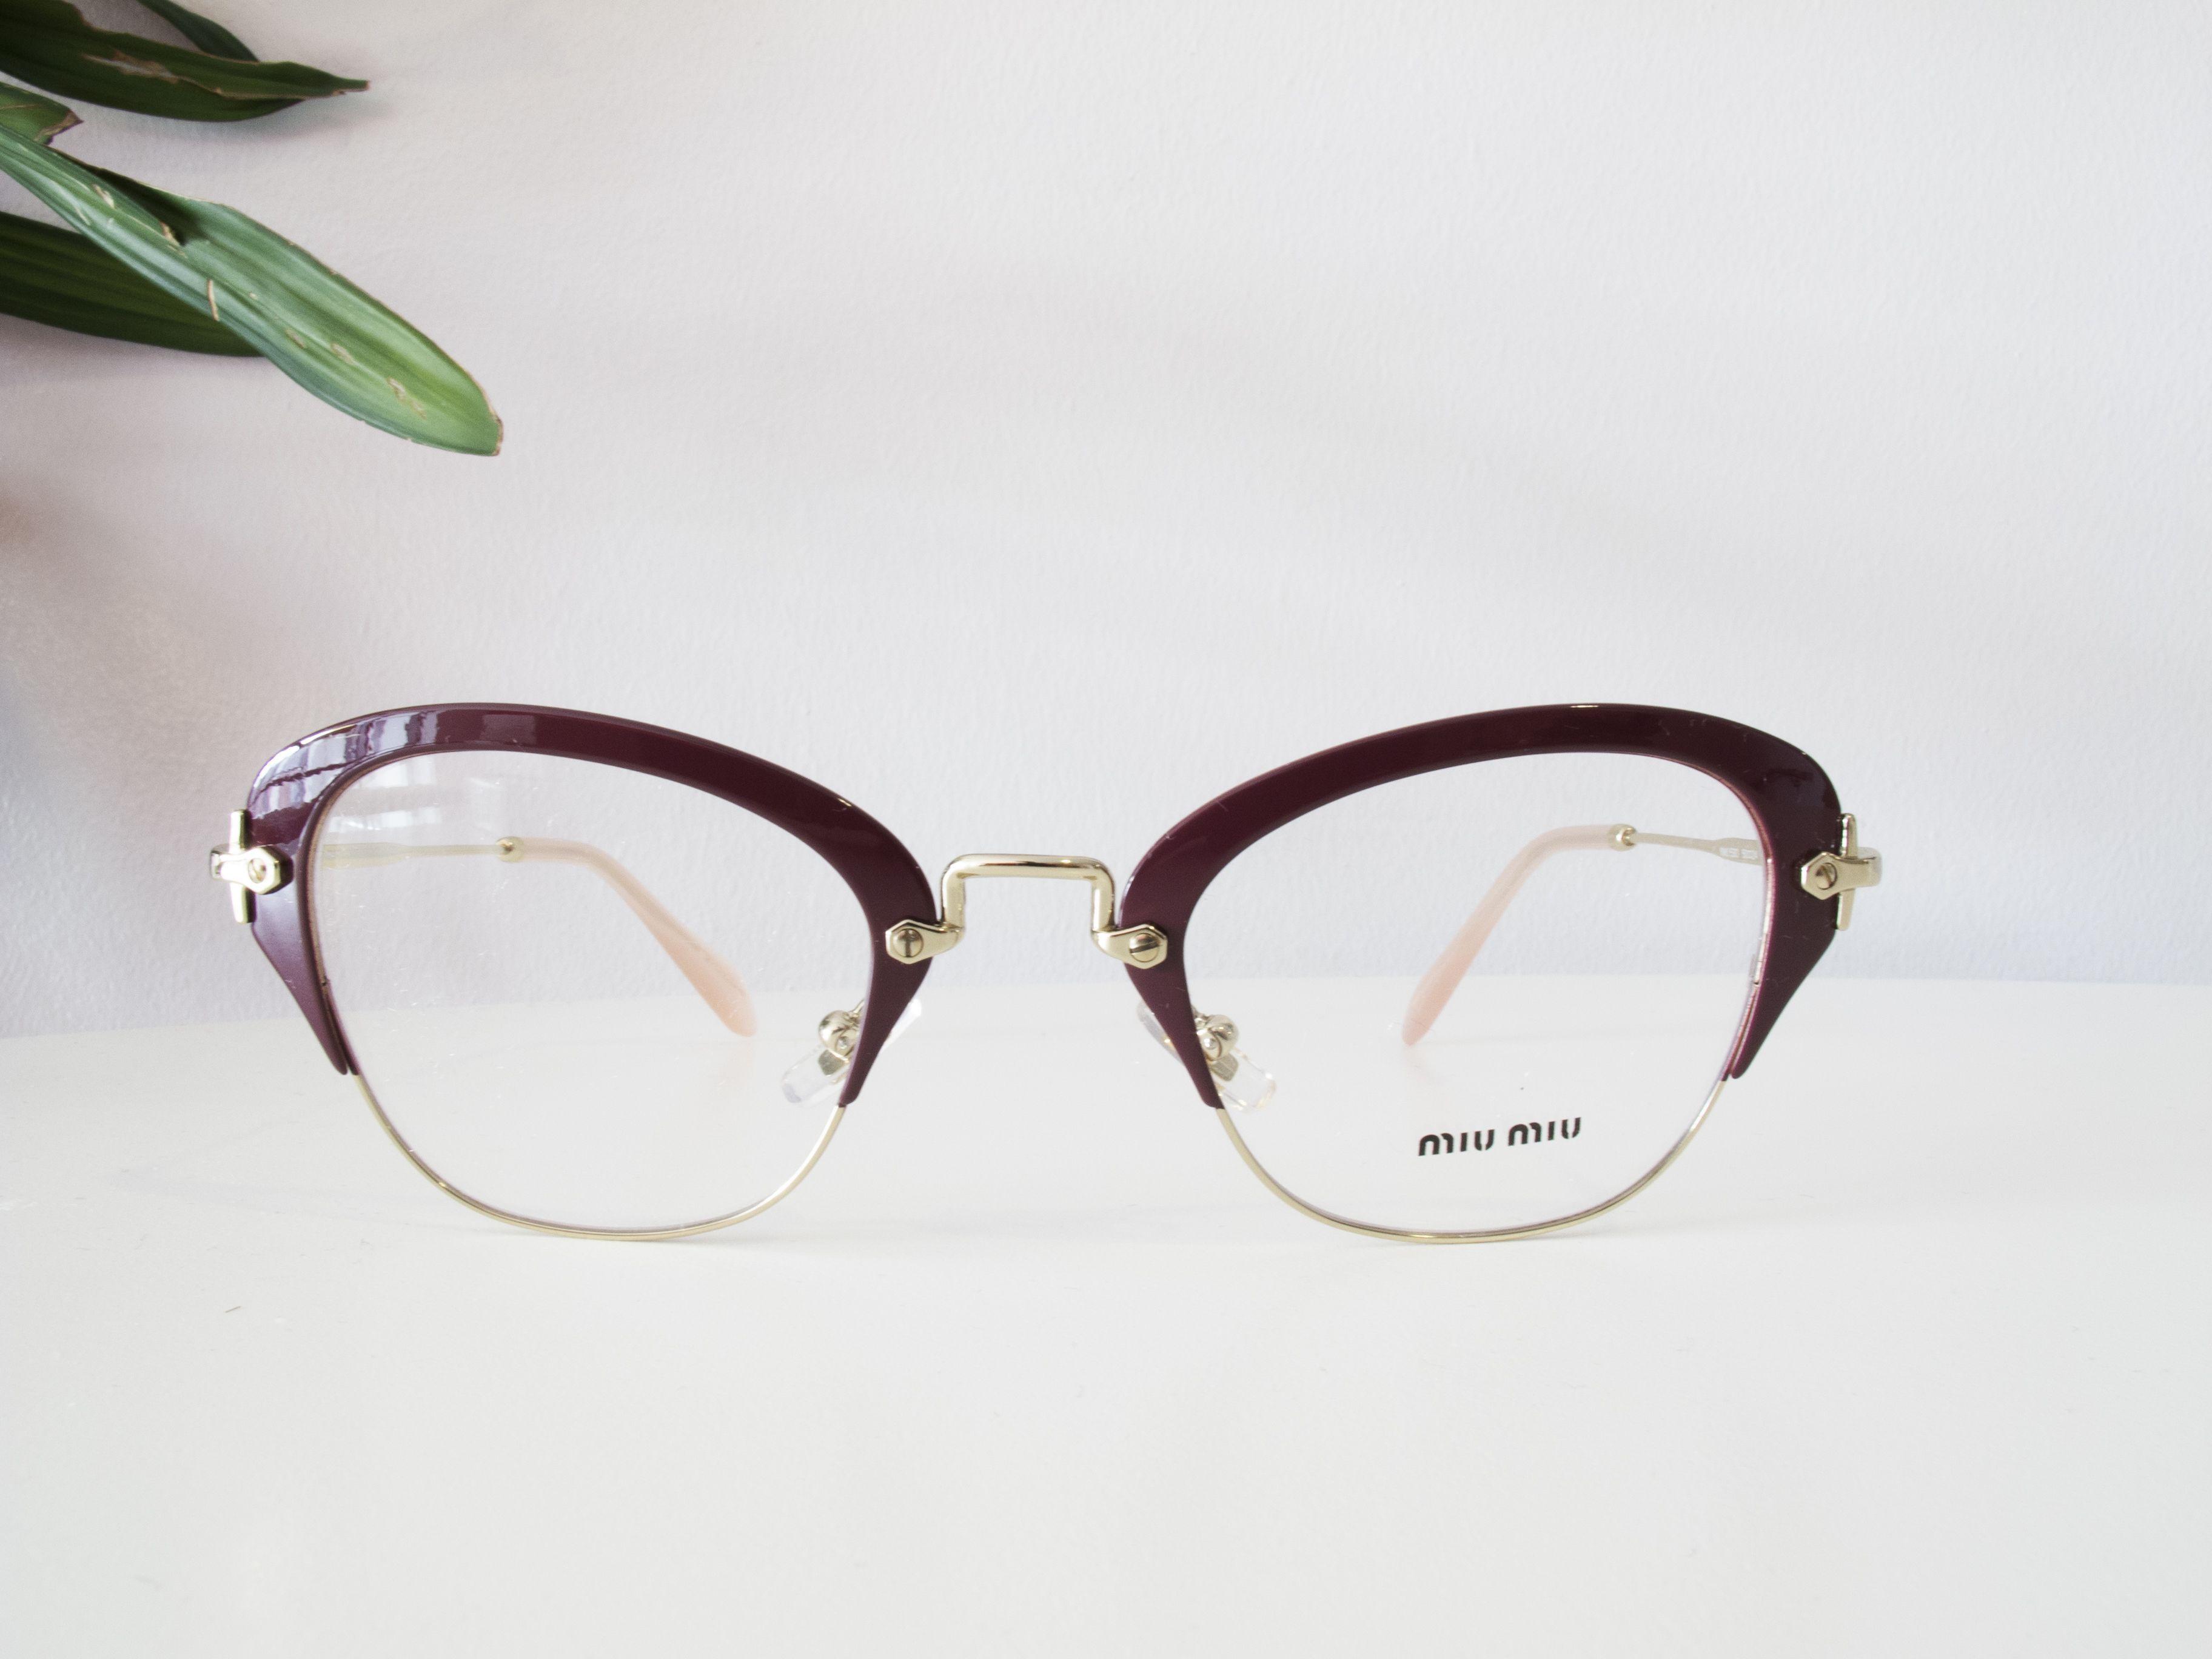 83c3f40ab86d Beautiful Miu Miu Glasses in Amaranth. Miu Miu is the little trendy sister  brand of Prada. Here at Red Hot Sunglasses we stock designer sunglasses and  ...